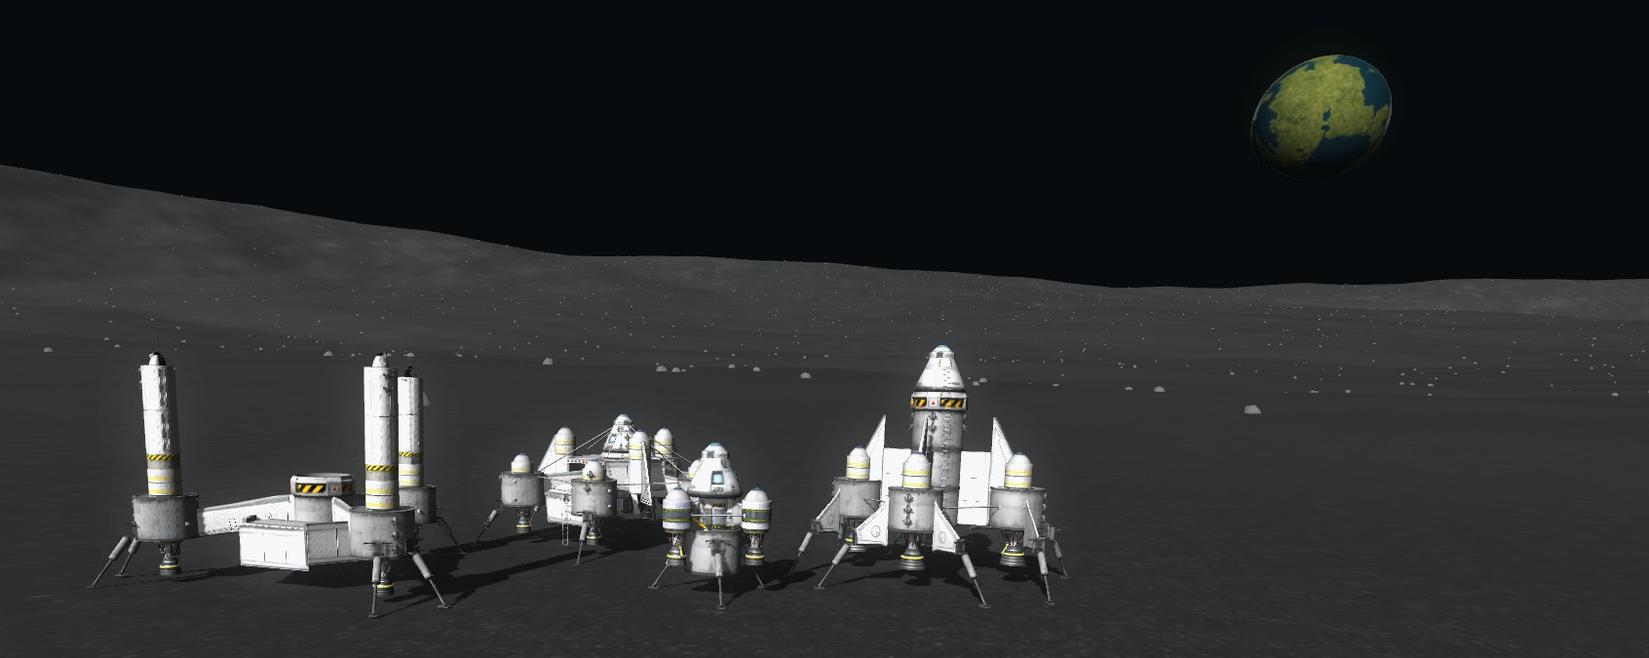 Kerbal Space Program: Munbase - SimHQ Forums